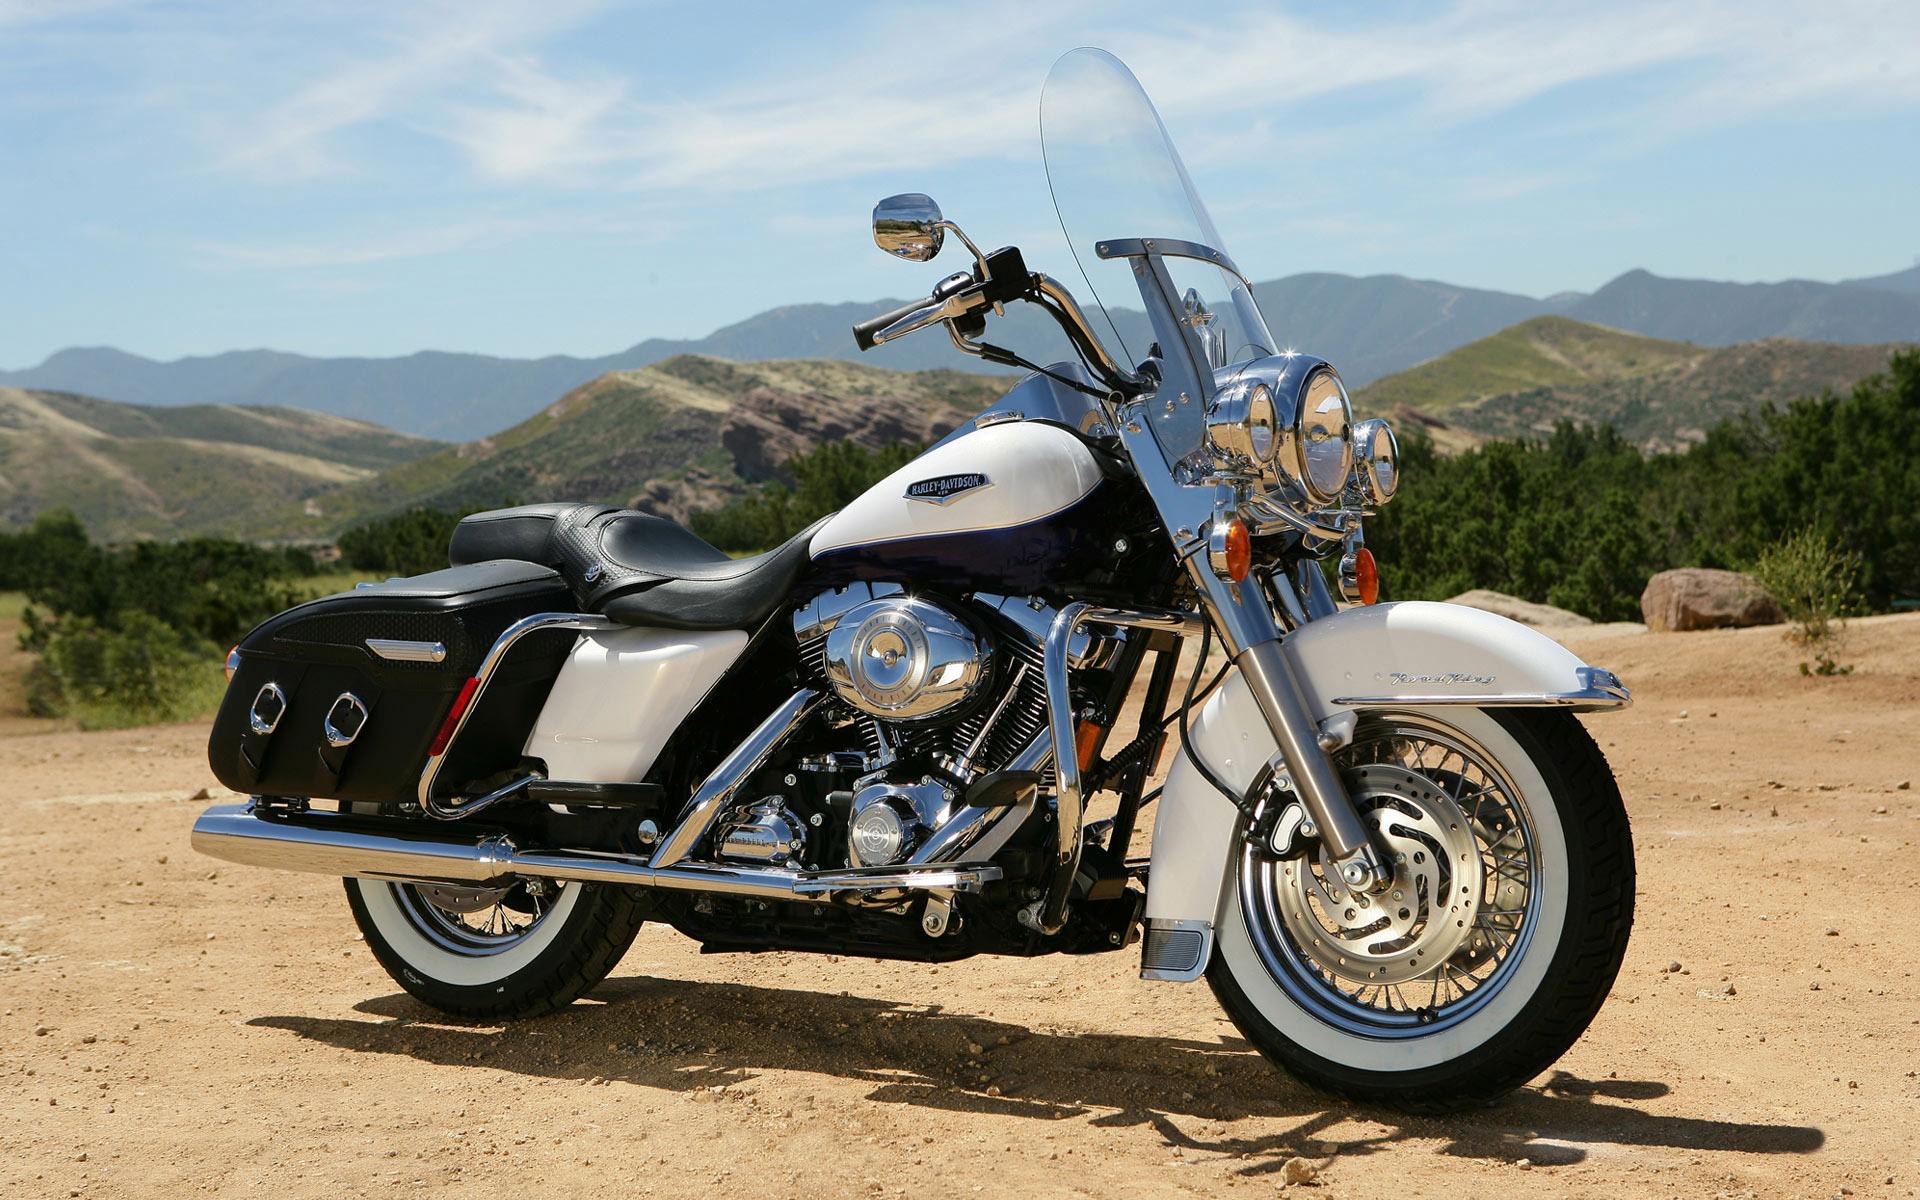 Motocycles Harley Davidson Harley Davidson motorcycle for men 012192 1920x1200